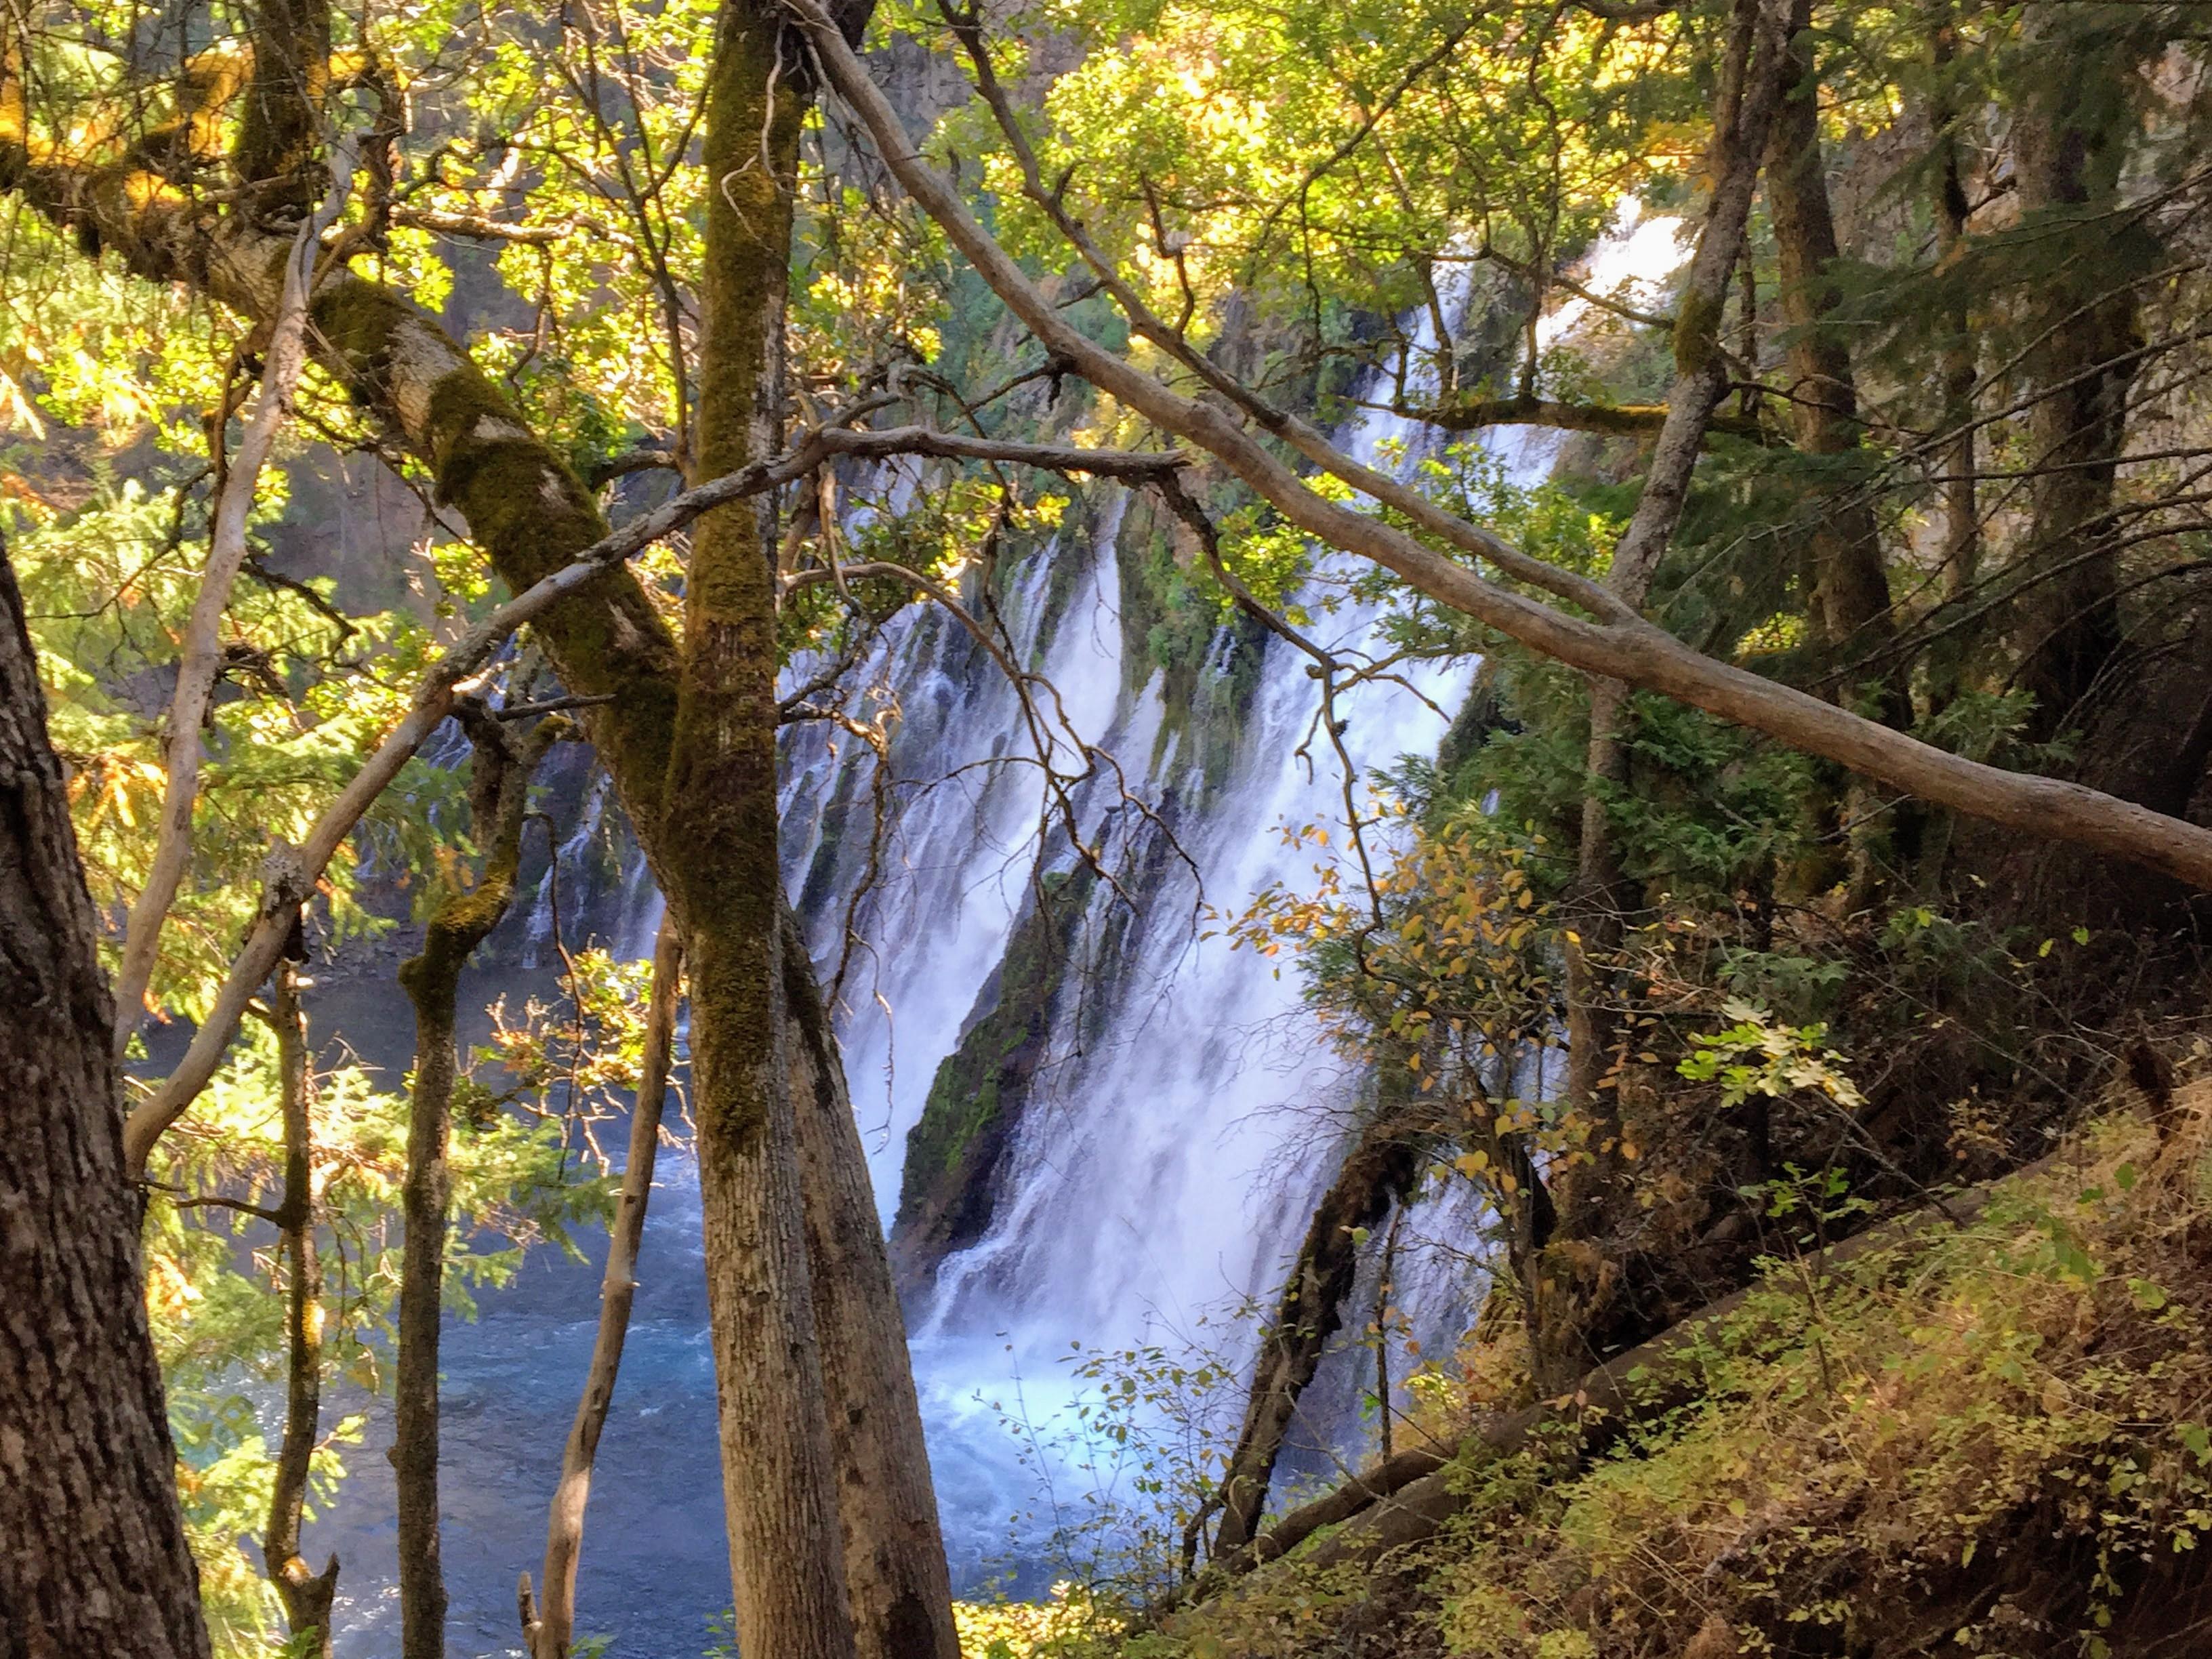 2017-10-05 California 02 Burney Falls 04